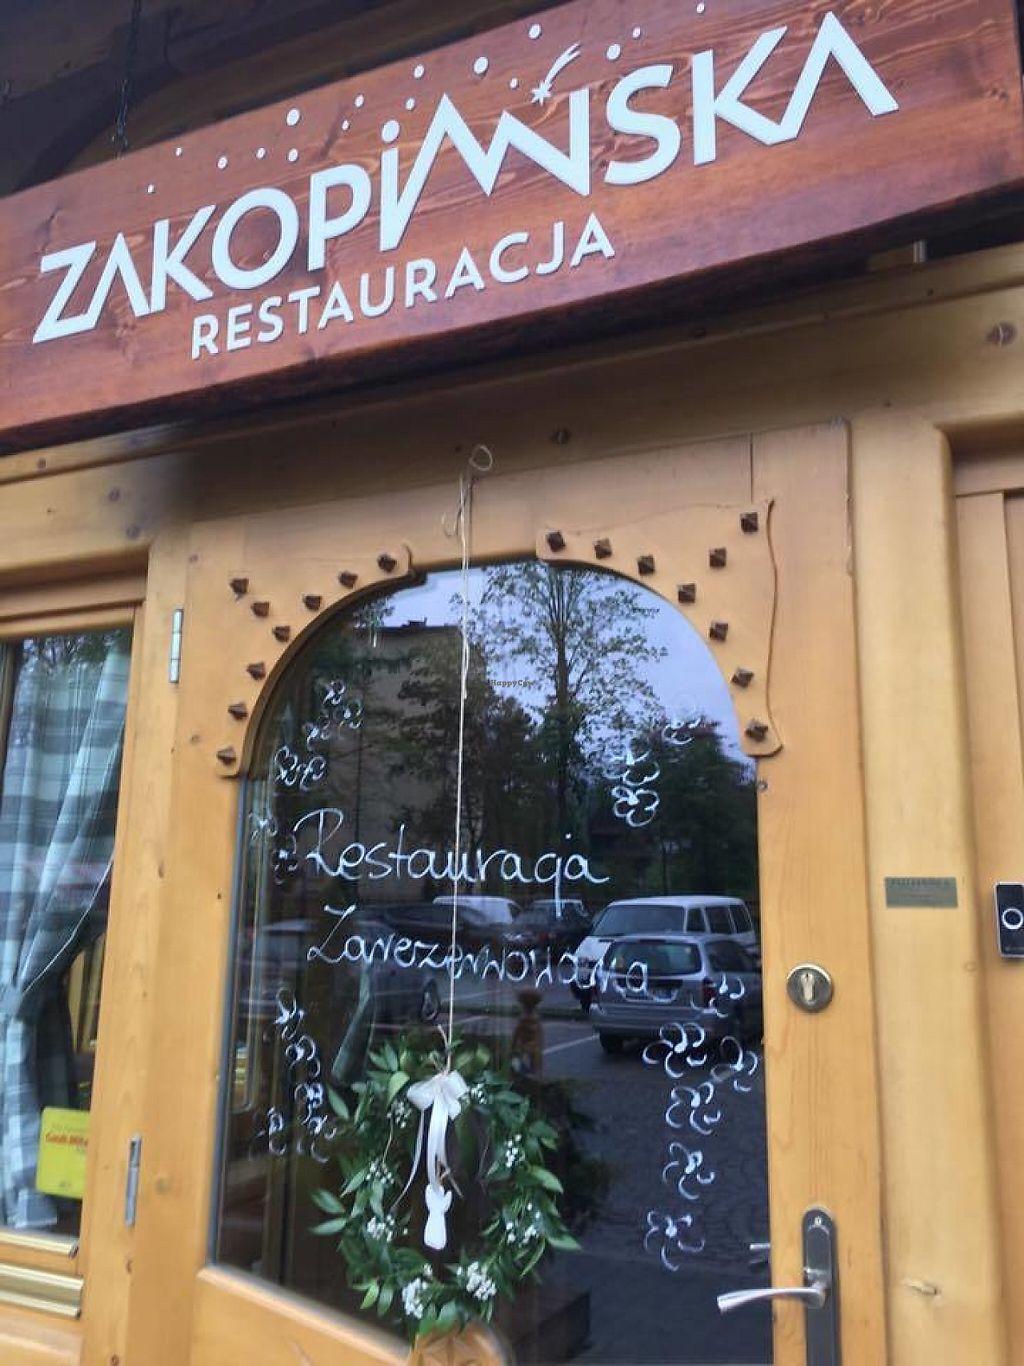 "Photo of Restauracja Zakopiańska  by <a href=""/members/profile/community5"">community5</a> <br/>Restauracja Zakopiańska <br/> May 27, 2017  - <a href='/contact/abuse/image/92844/262942'>Report</a>"